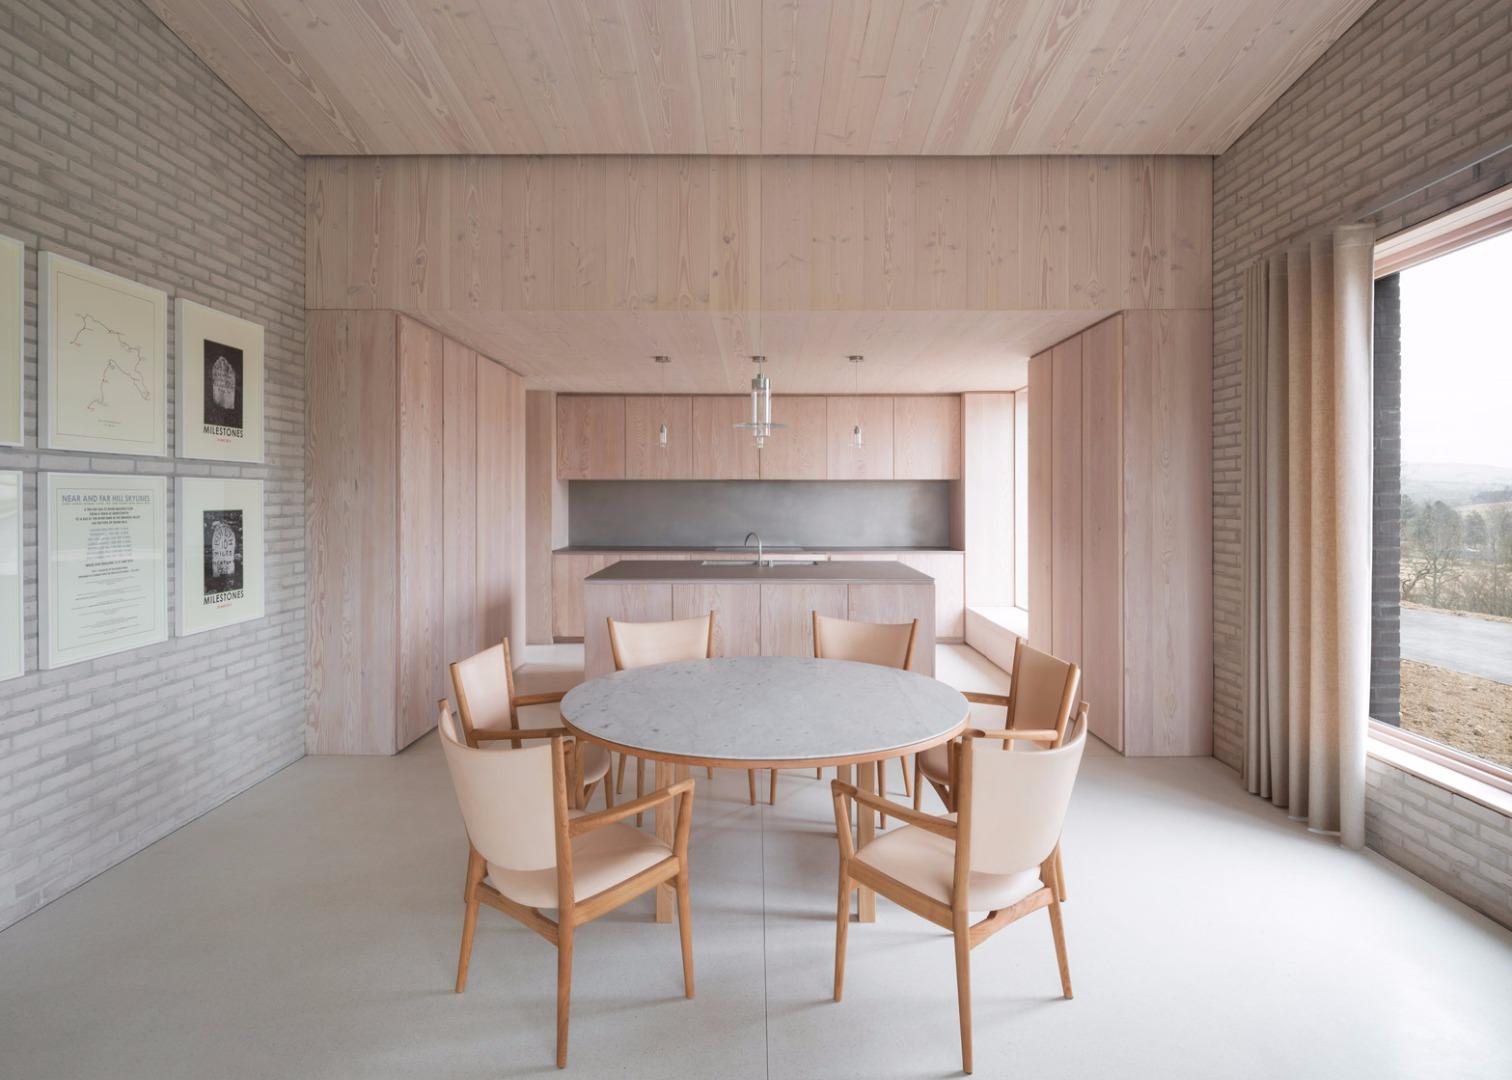 life-house-john-pawson-living-architecture-retreat-residential-brick-wales-uk-gilbert-mccarragher_dezeen_1568_3.jpg